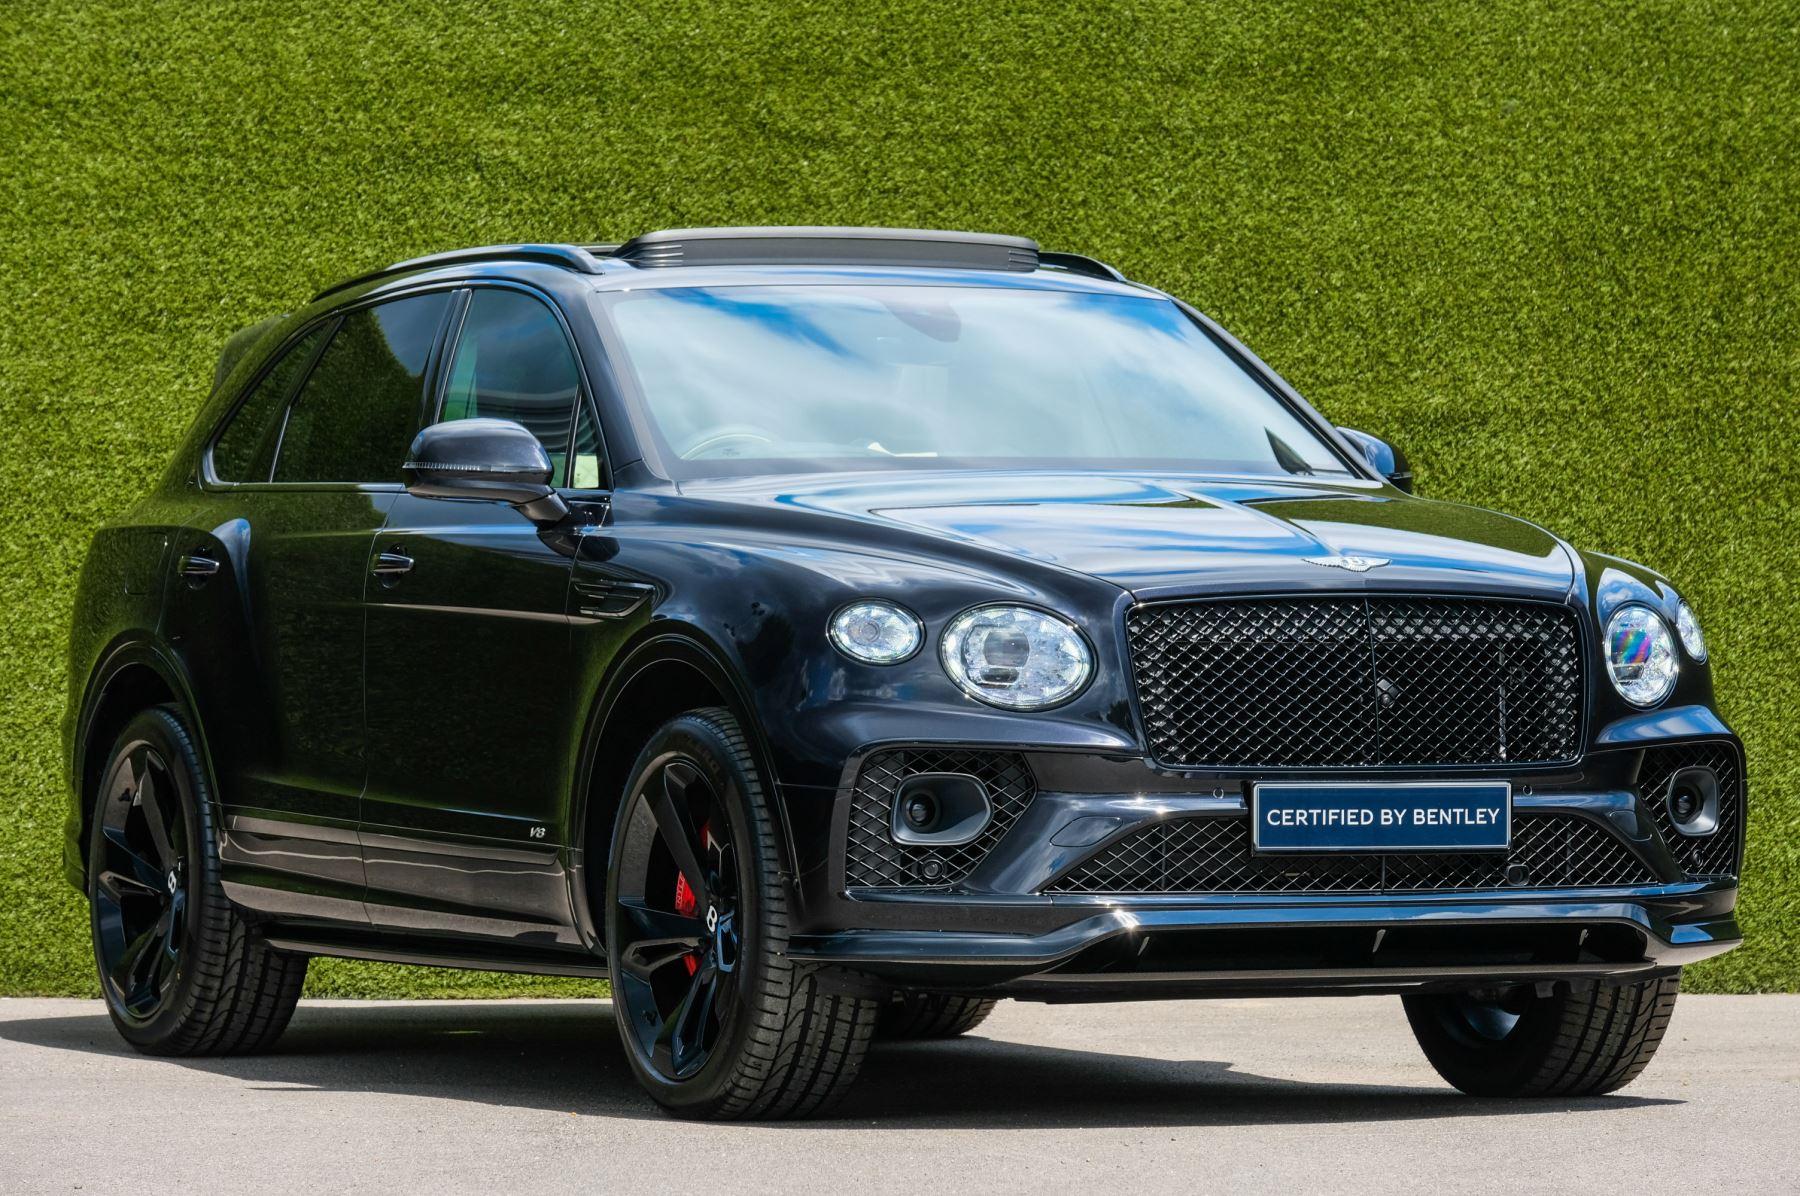 Bentley Bentayga 4.0 V8 - Mulliner Driving Specification for Black Specification Automatic 5 door Estate